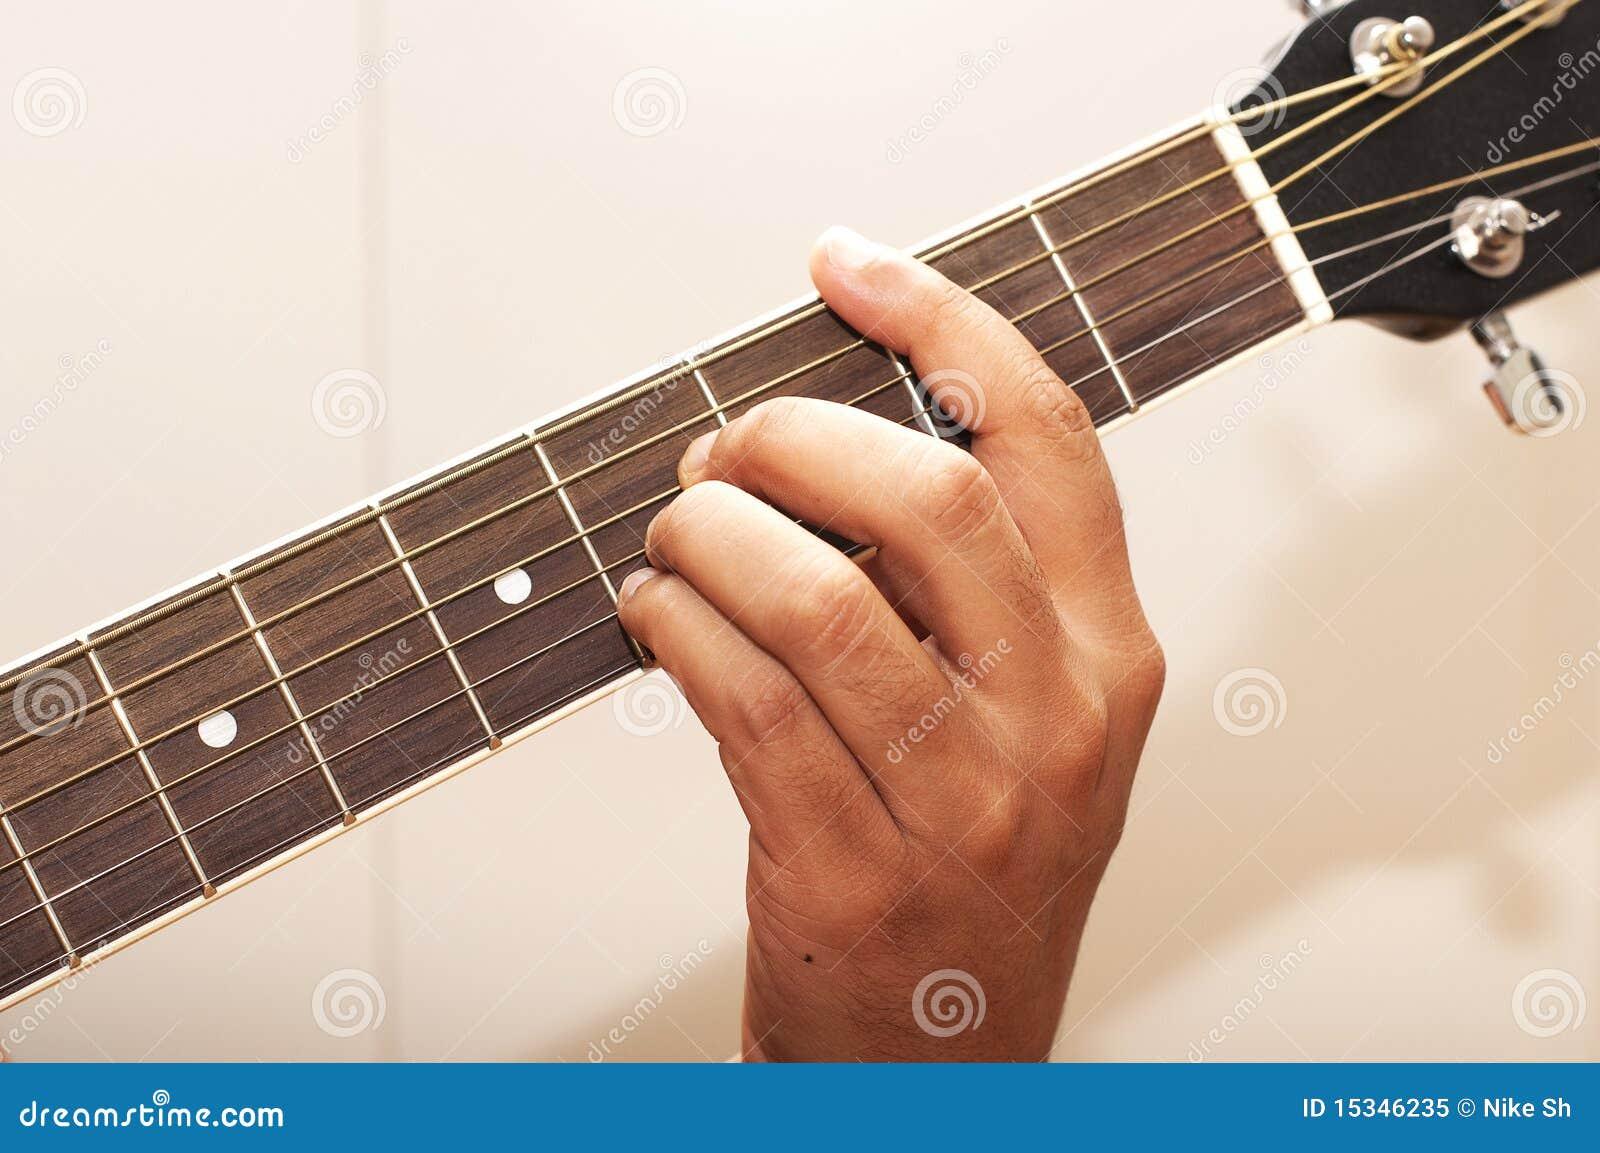 Guitar Chord B Royalty Free Stock Photo - Image: 15346235